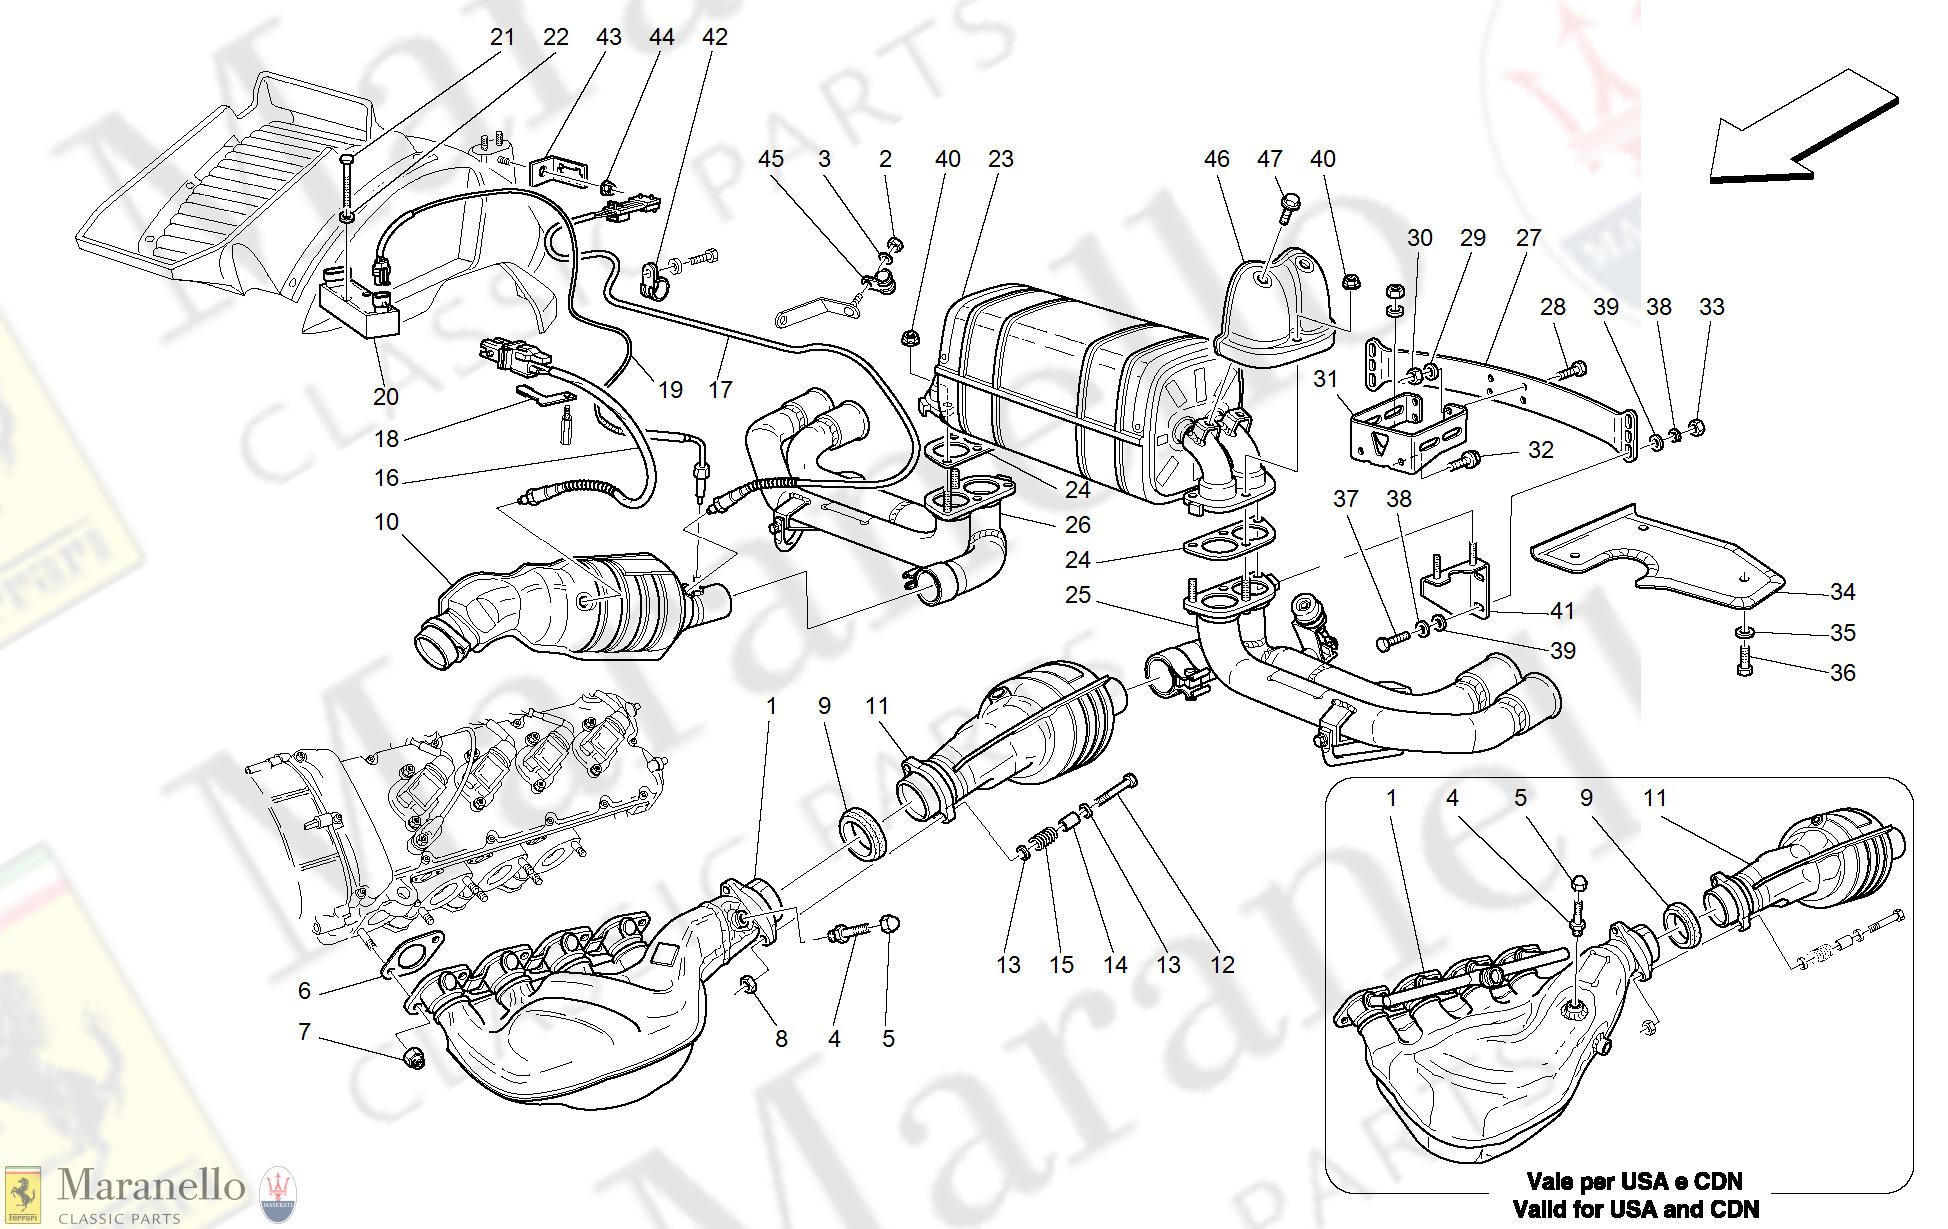 020 Racing Exhaust System Optional Parts Diagram For Ferrari 360 Modena Maranello Classic Parts